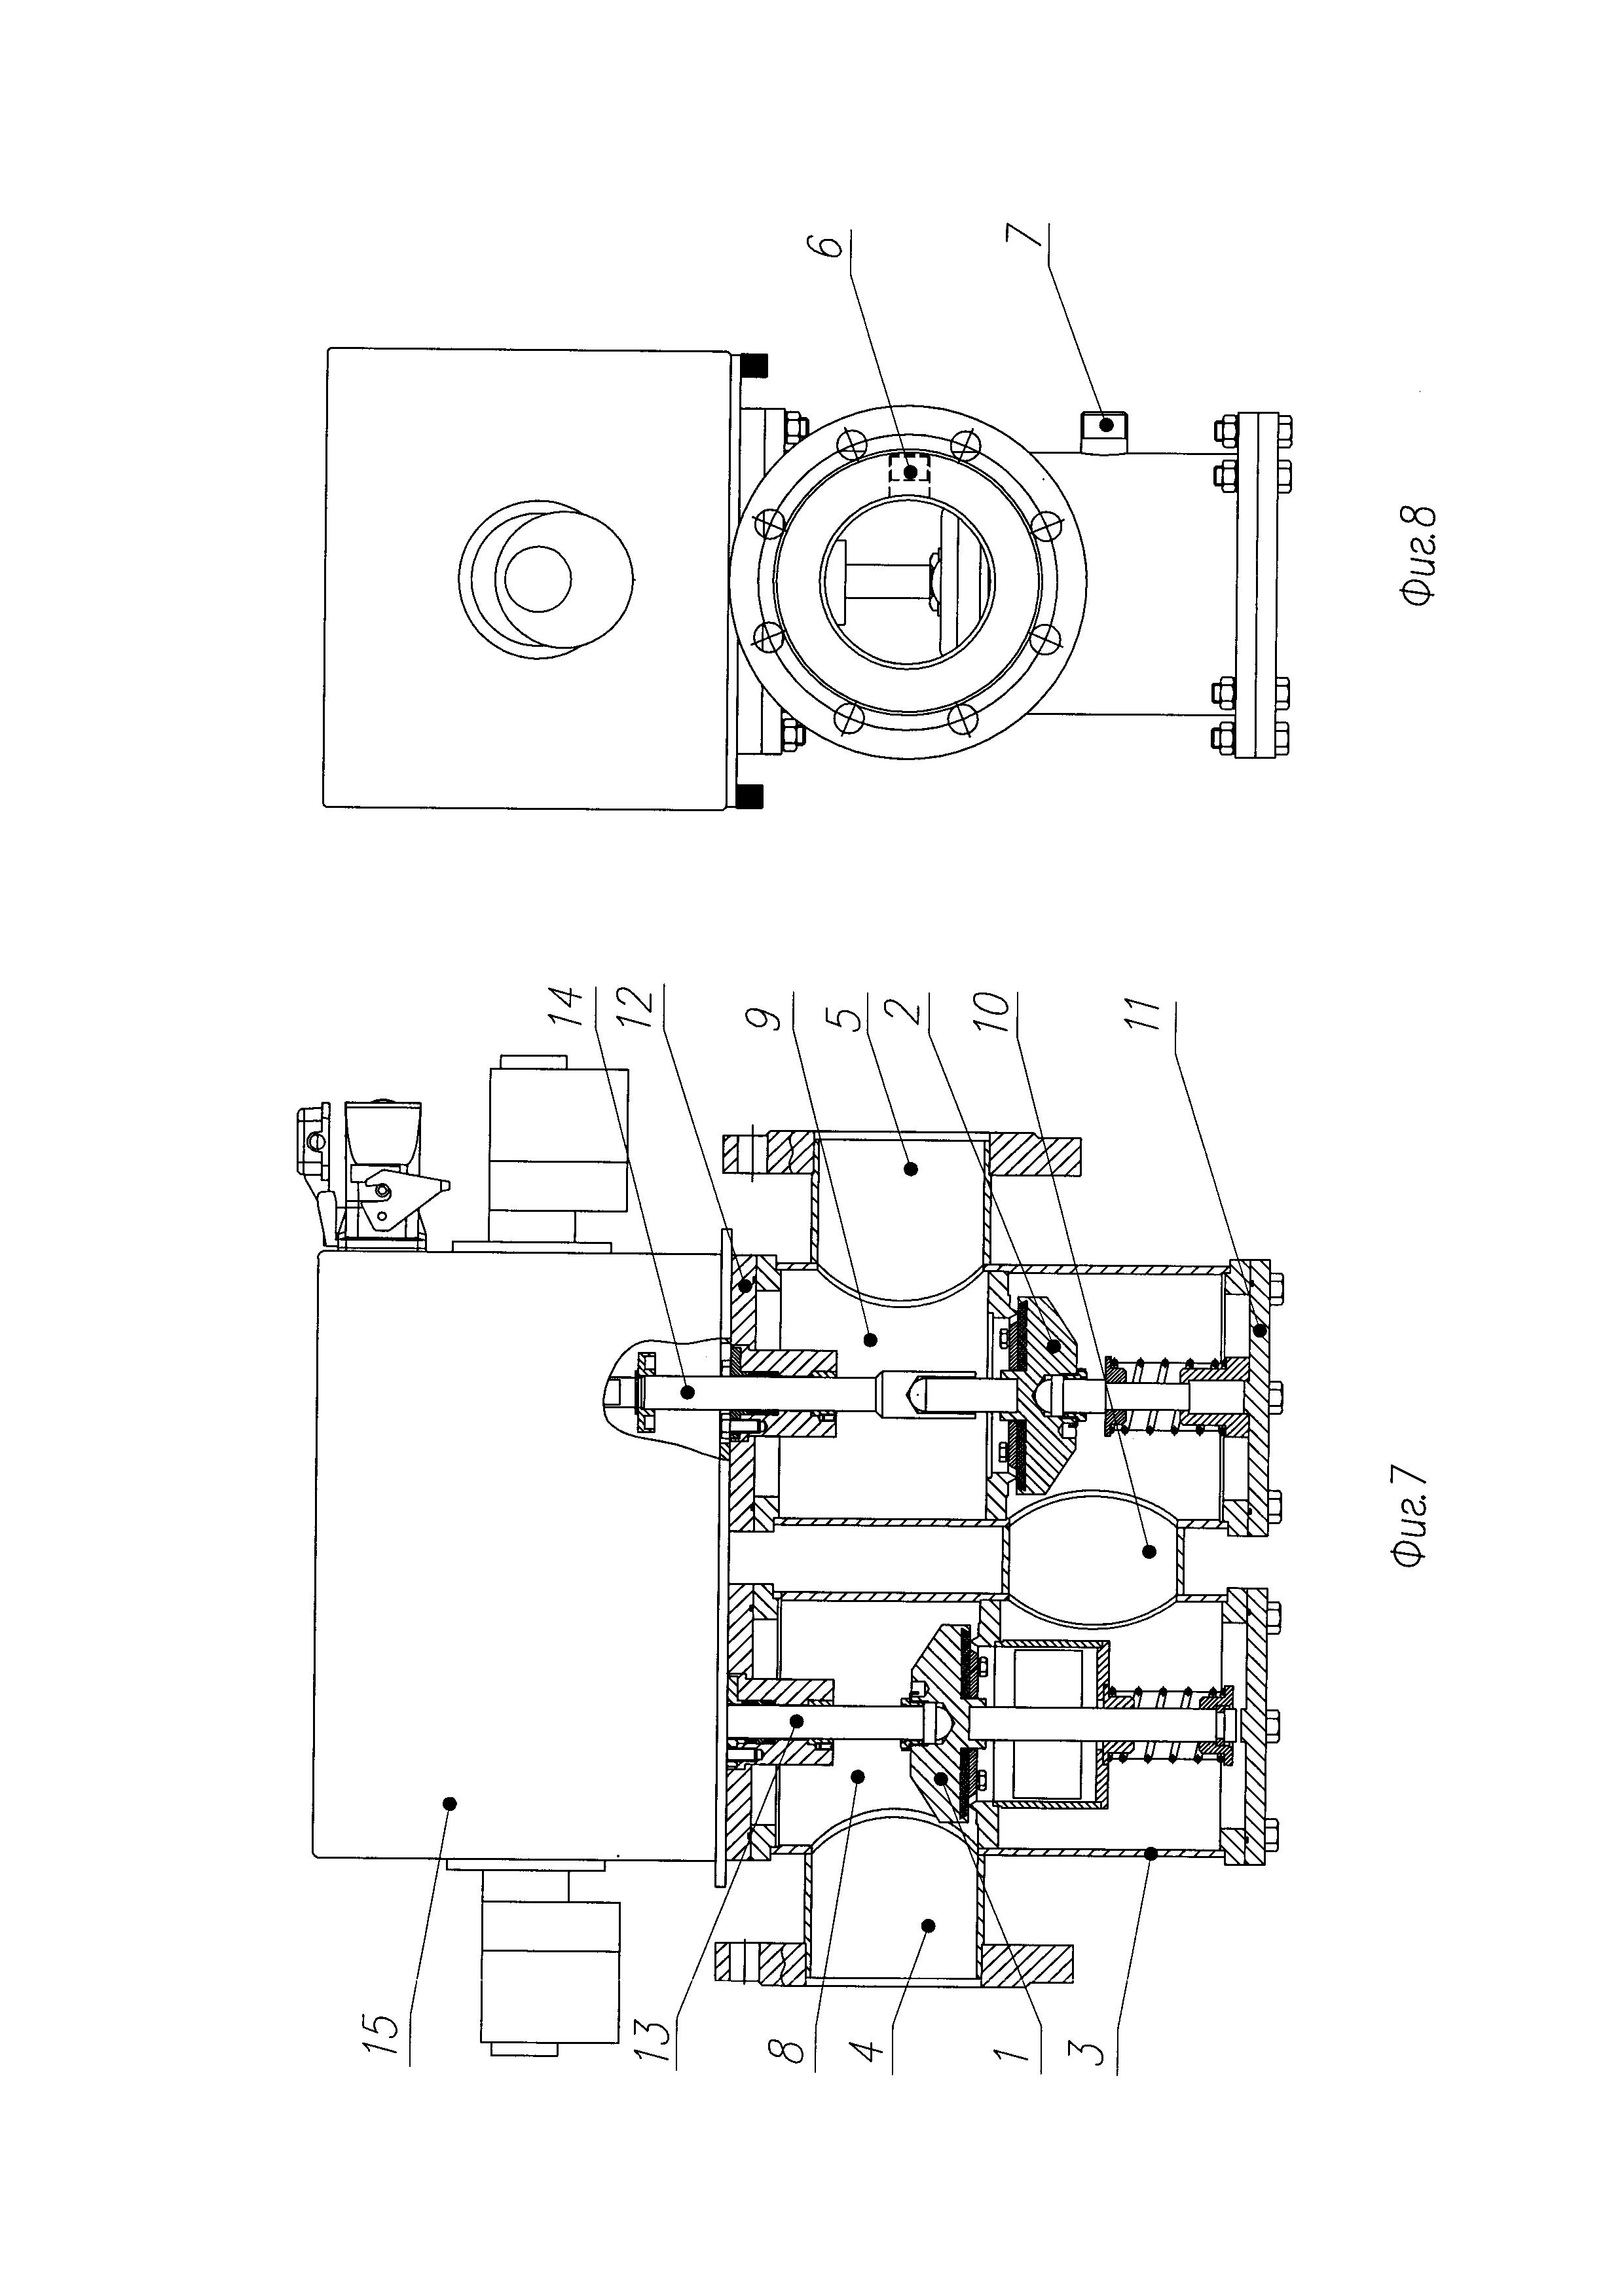 Привод автоматического газового запорного клапана